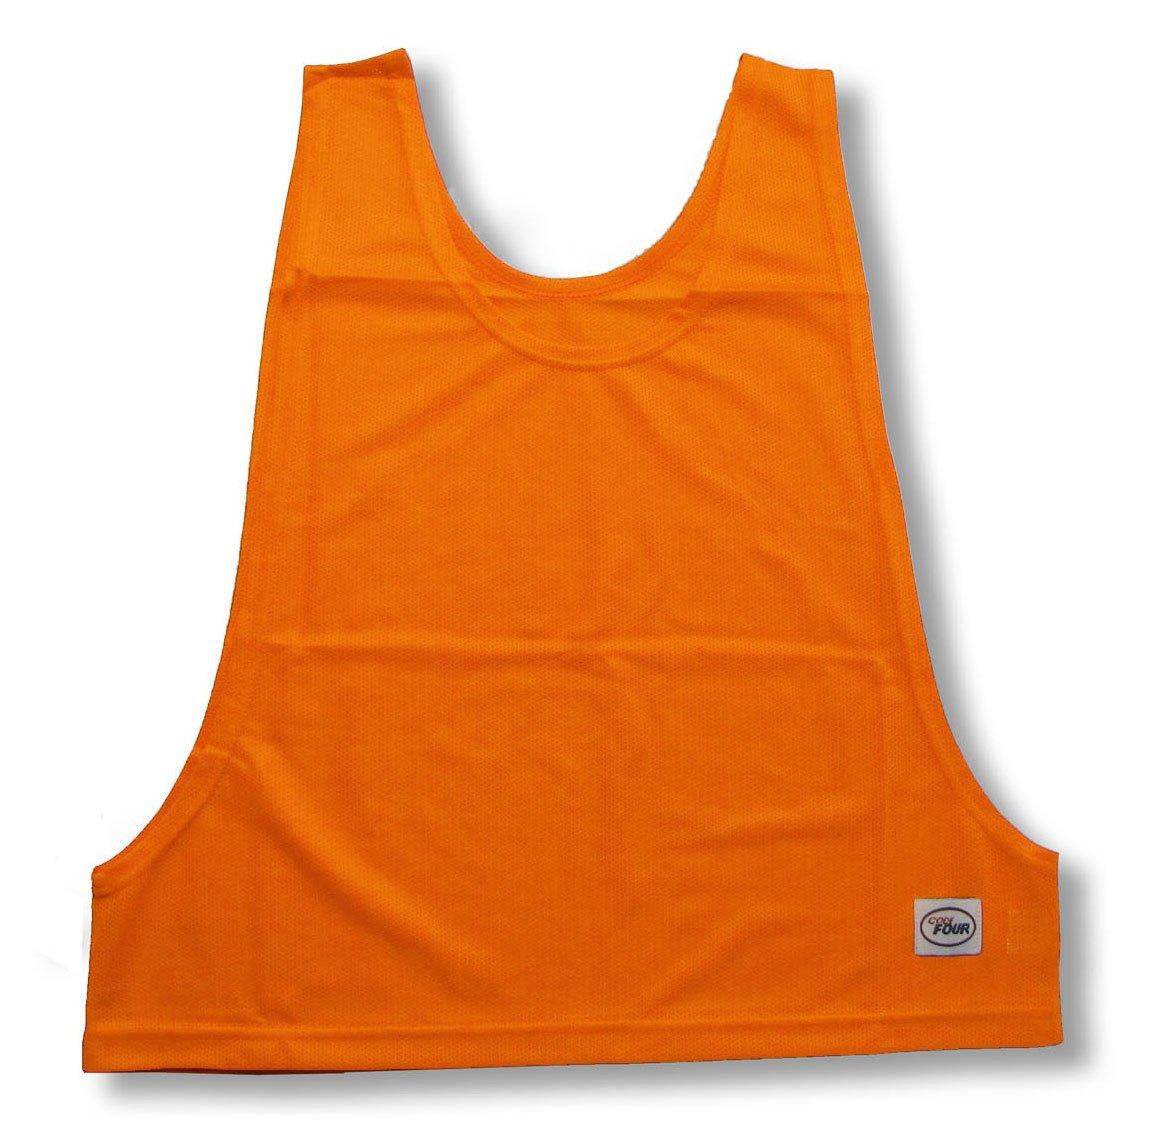 Code Four Athletics APPAREL メンズ B00UCFMQ14 Adult Size|オレンジ オレンジ Adult Size